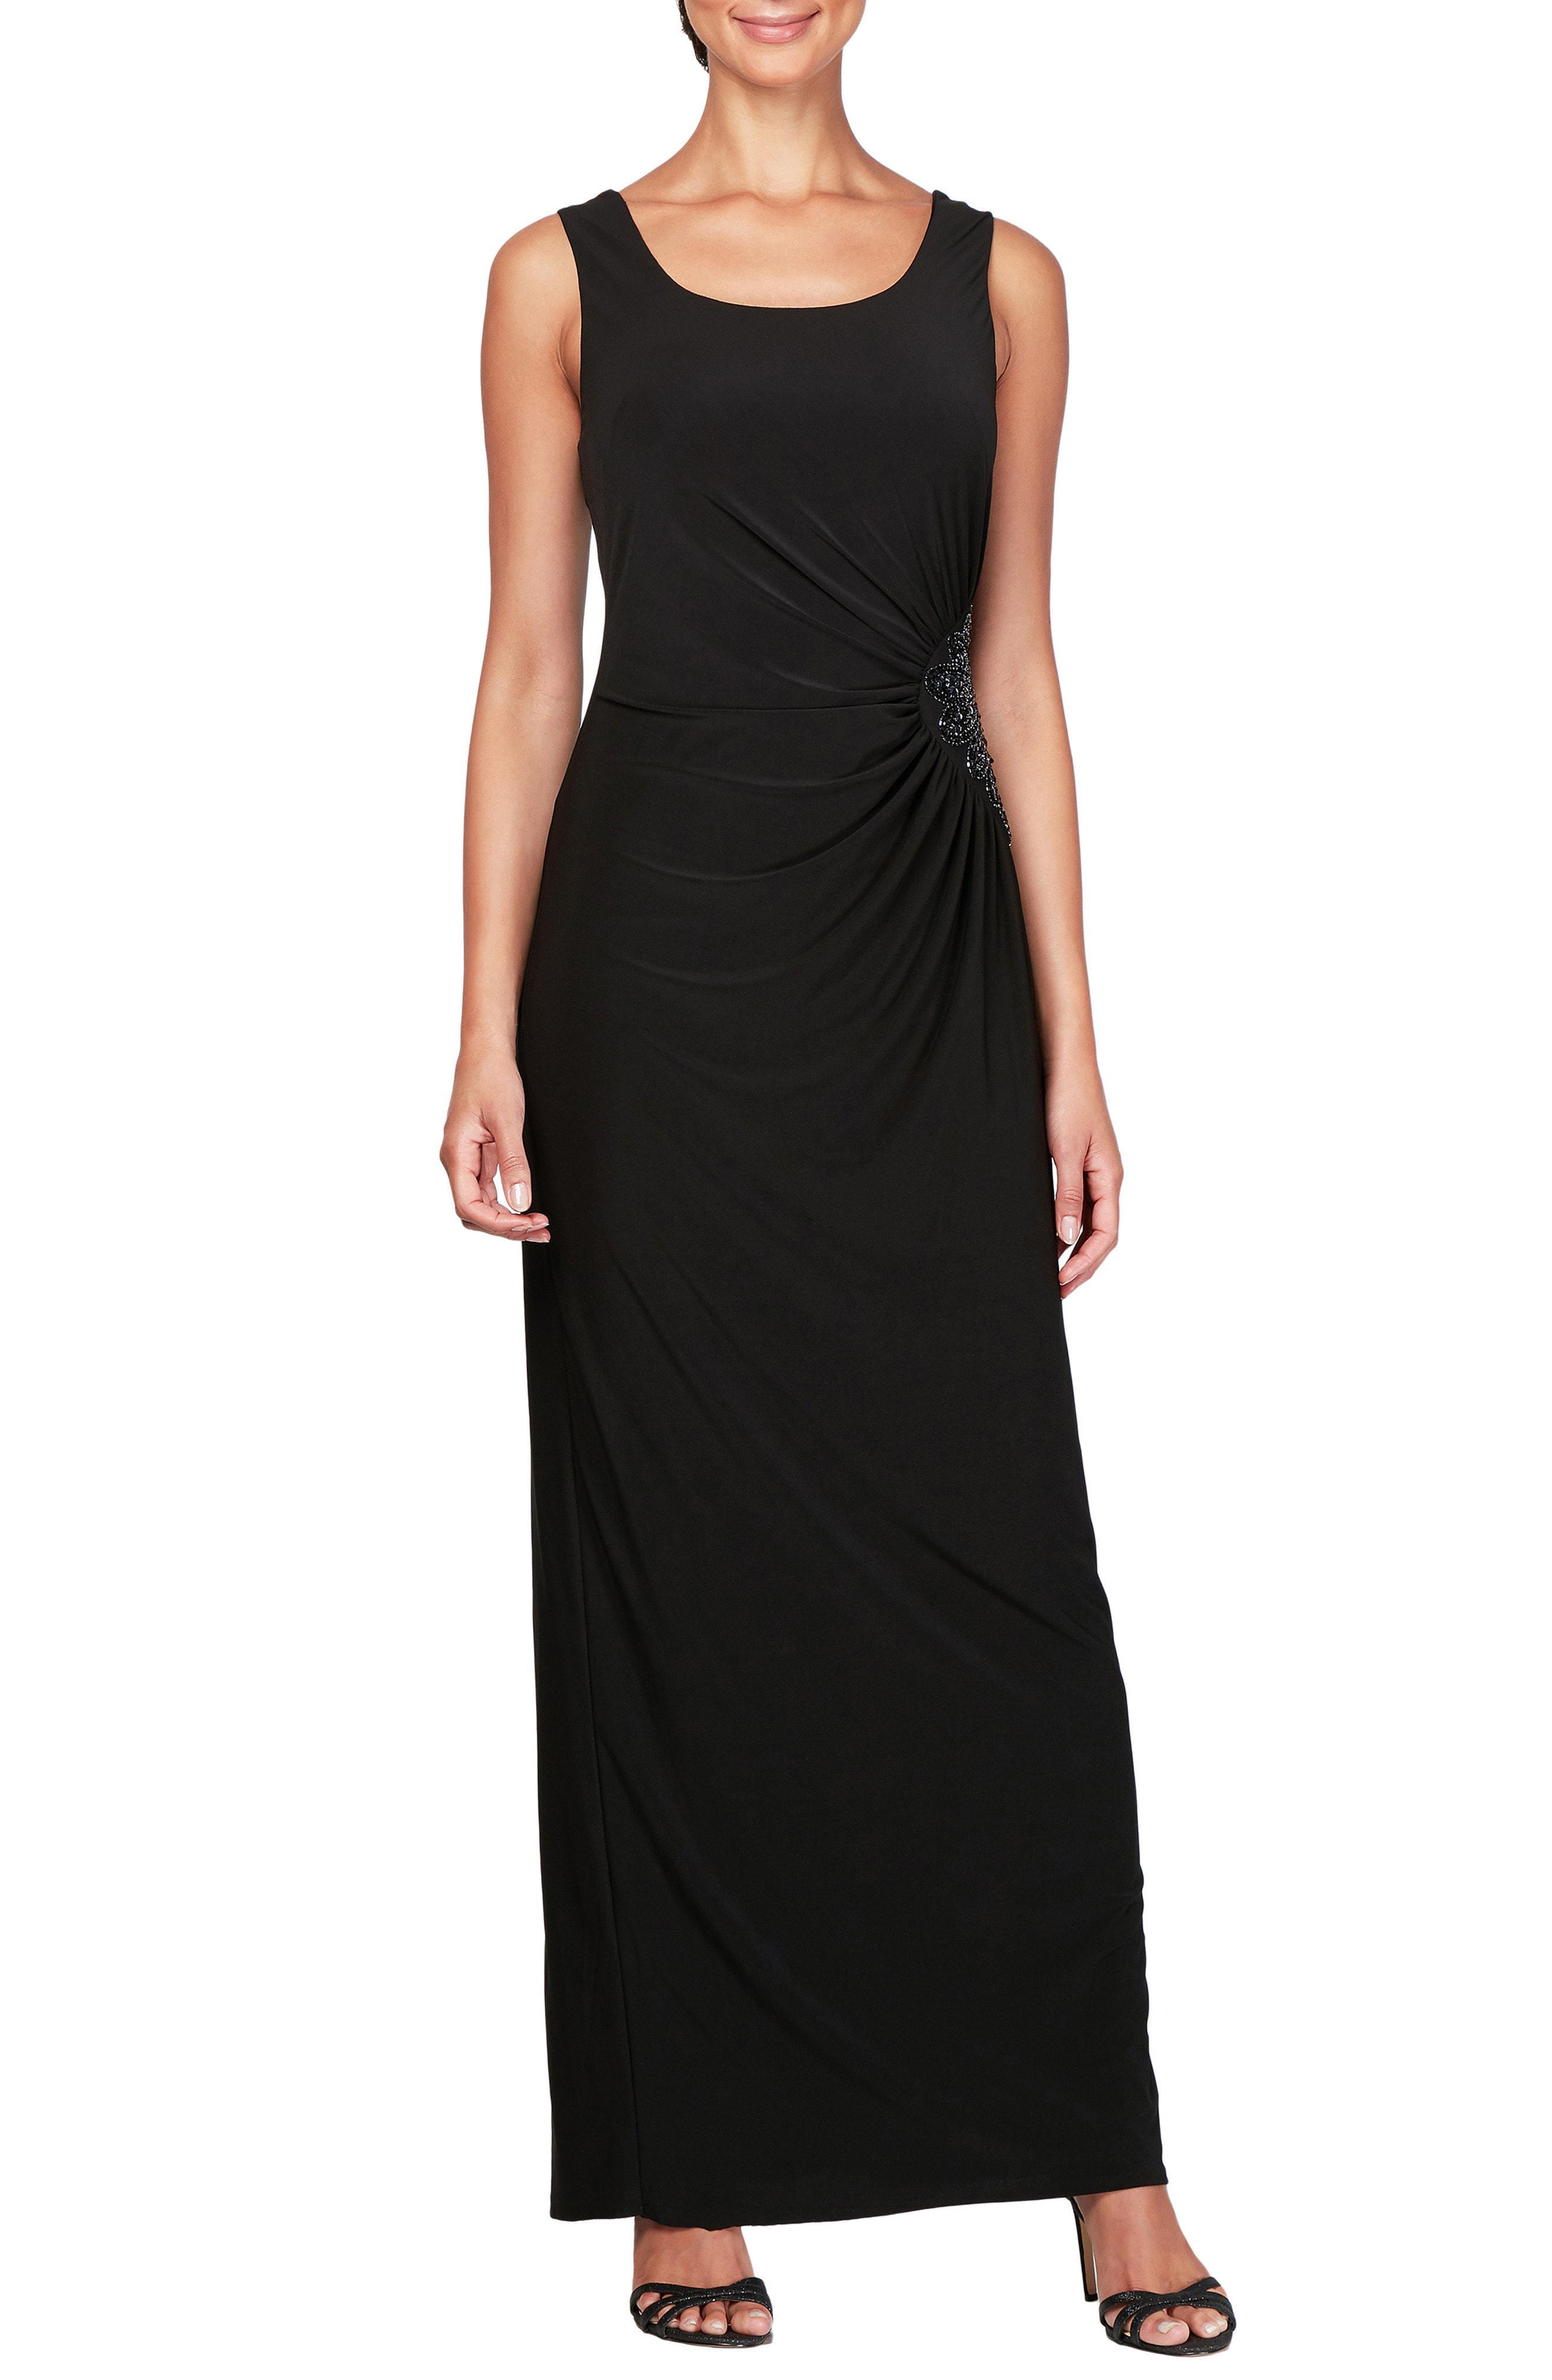 80151d065b0 Lyst - Alex Evenings Ruched Maxi Dress   Jacket in Black